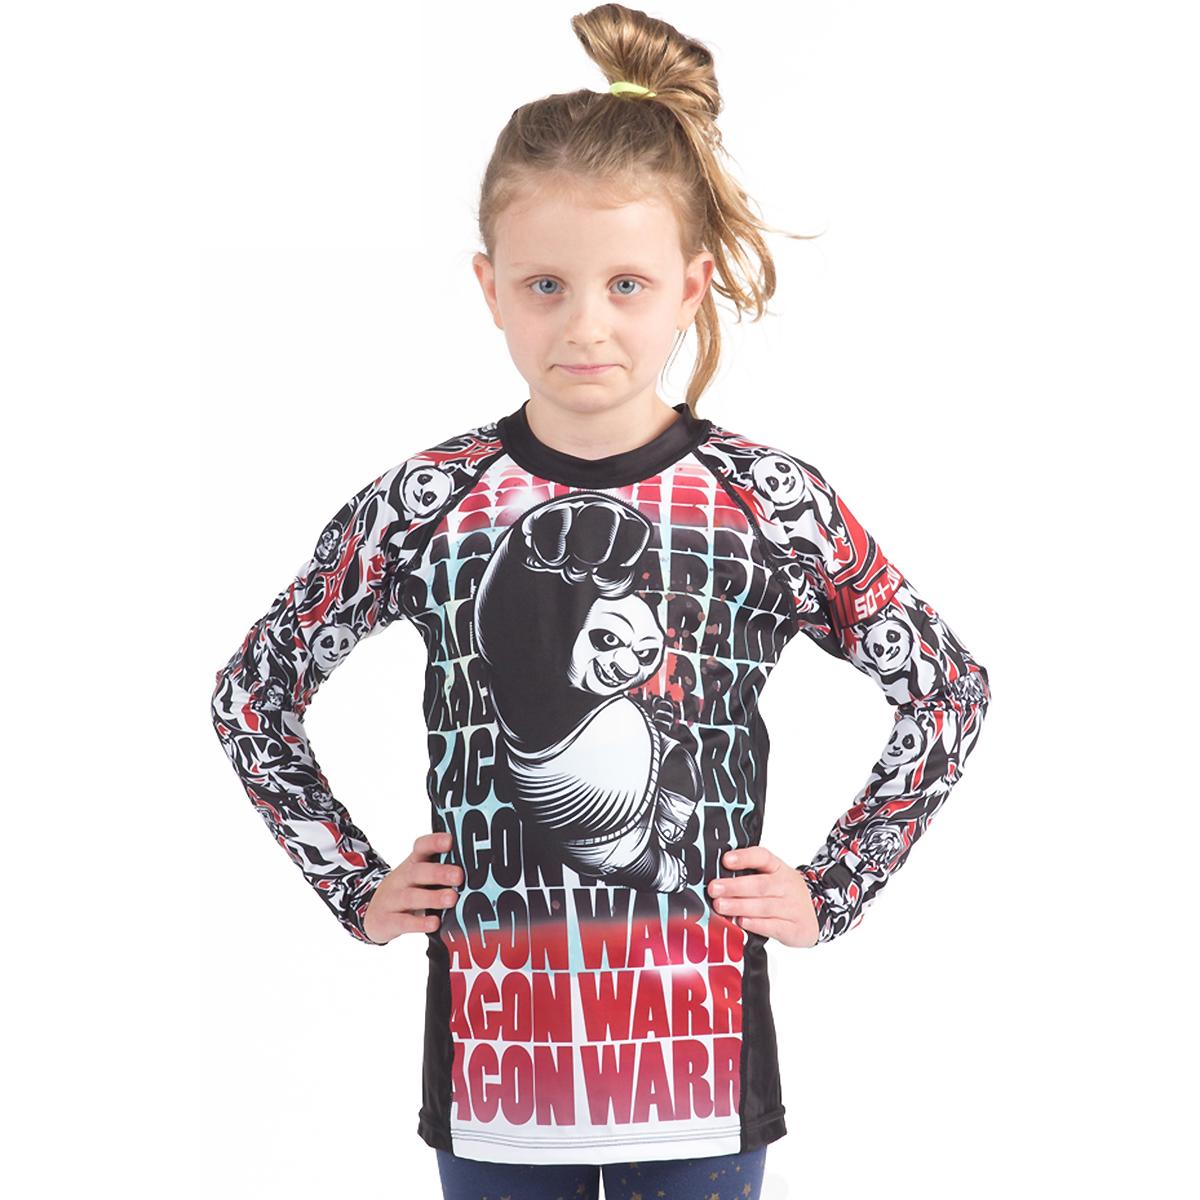 Fusion Fight Gear Kid's KFP Dragon Warrior Long Sleeve Rashguard - White